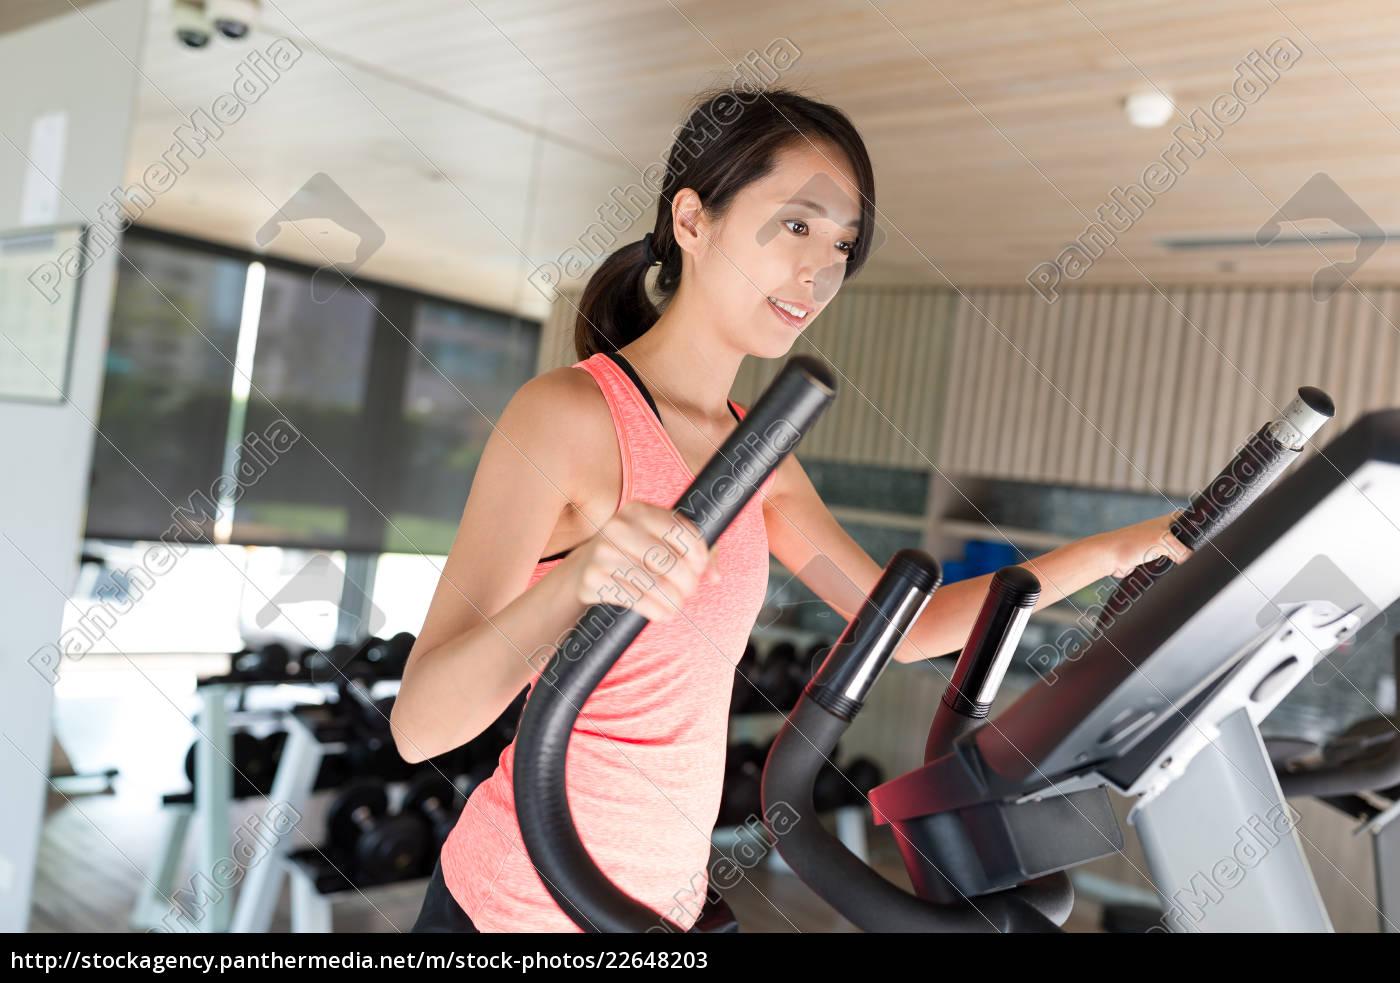 woman, training, on, elliptical, machine, in - 22648203